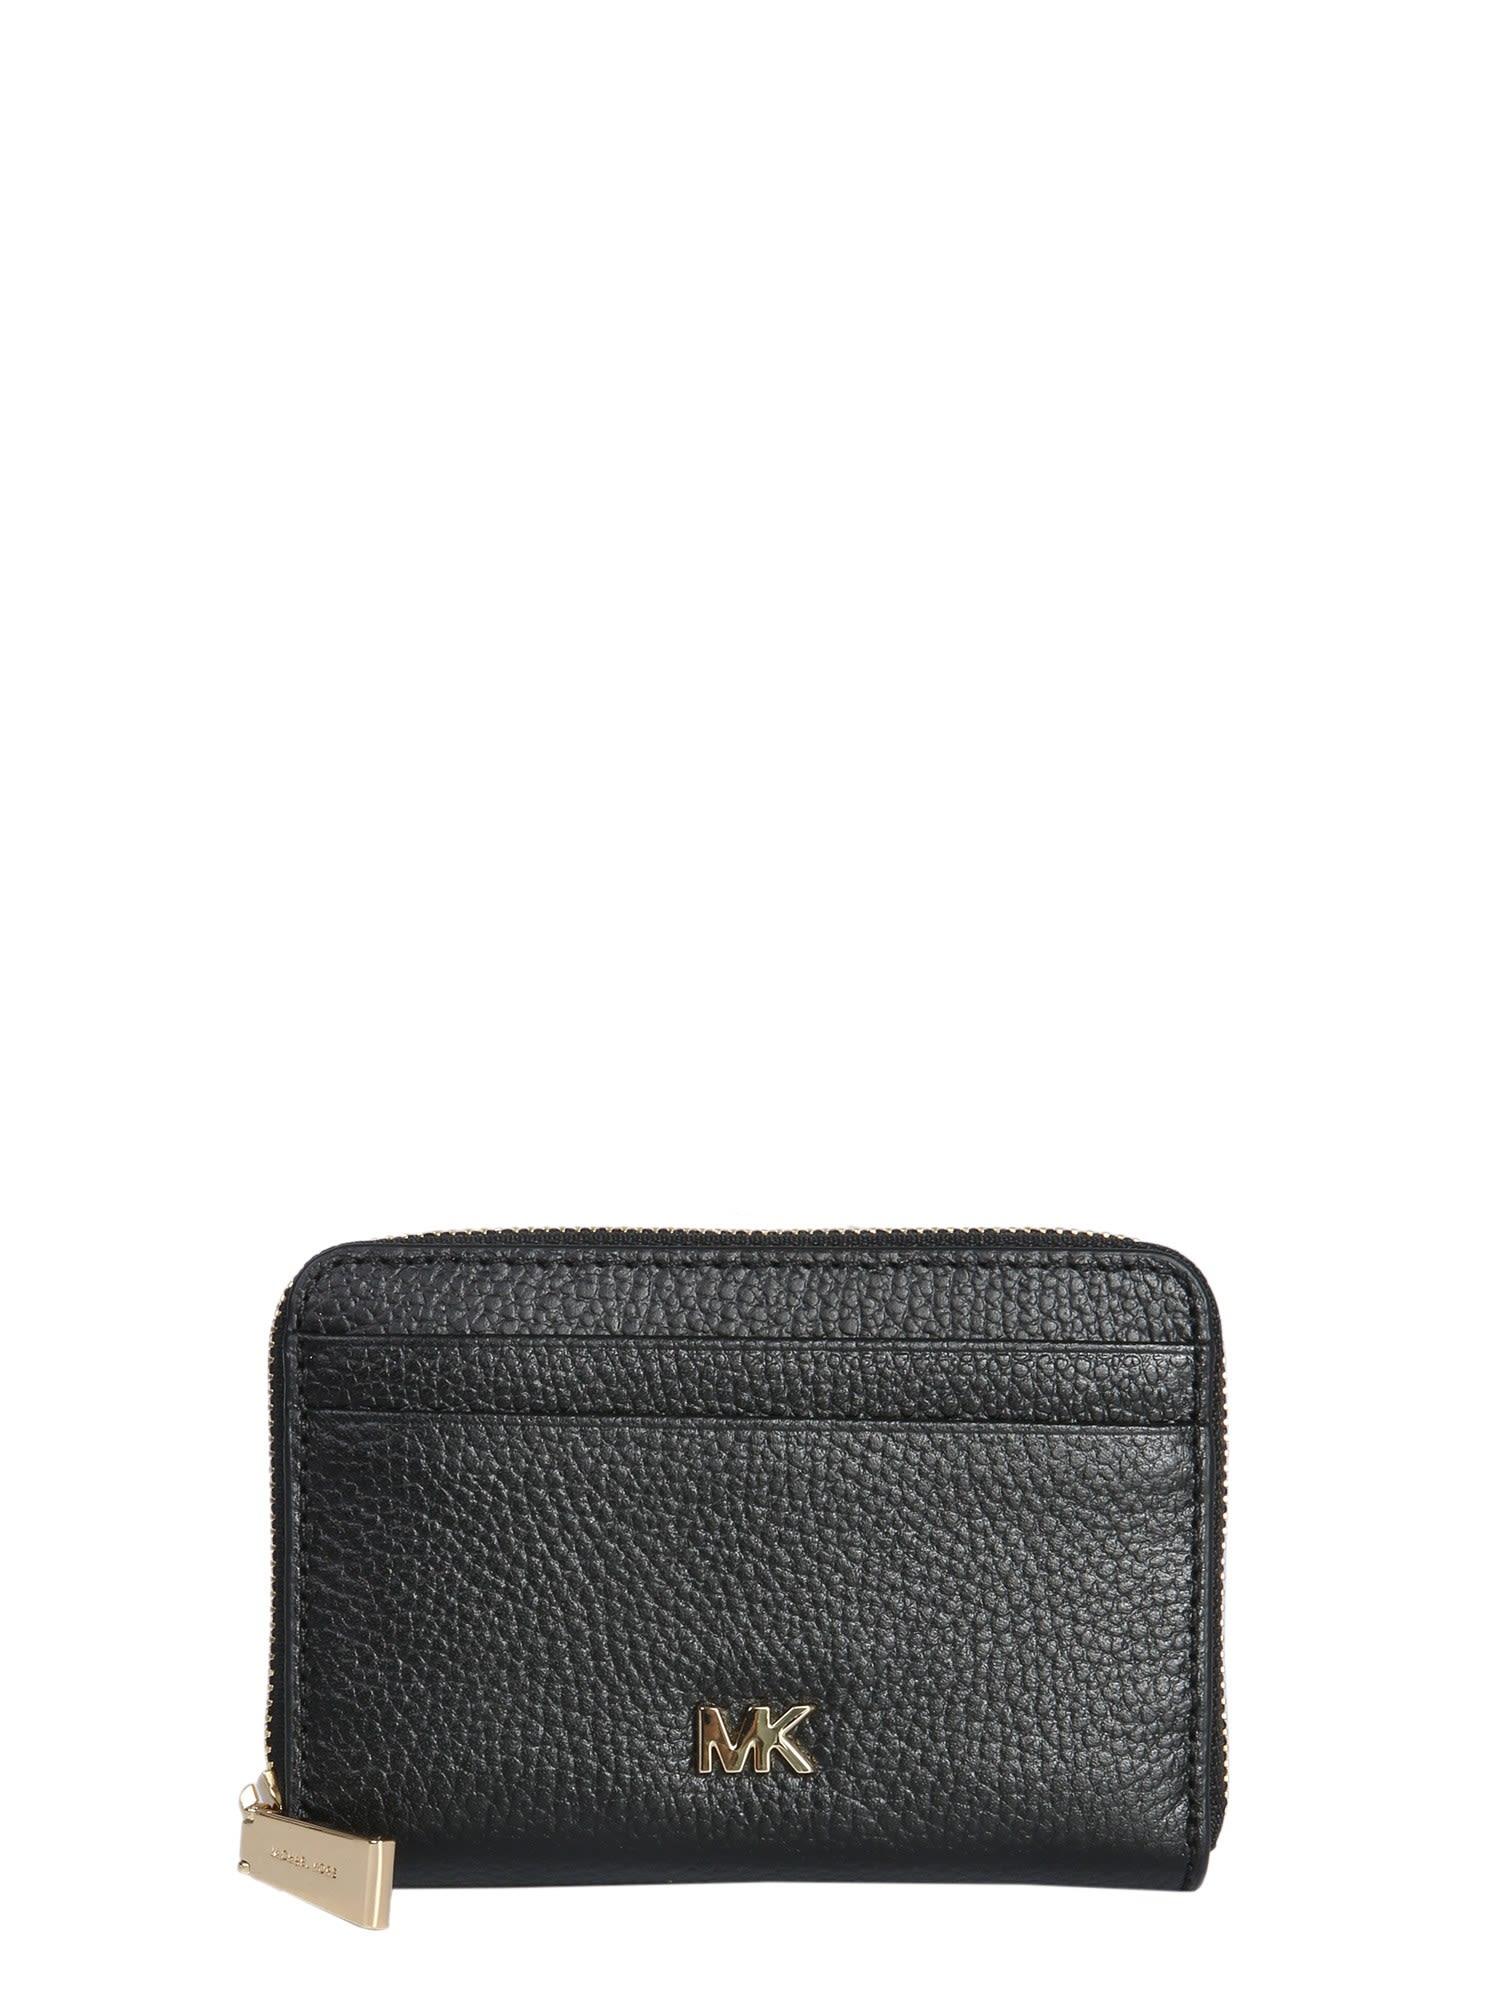 MICHAEL Michael Kors Small Jet Wallet Set